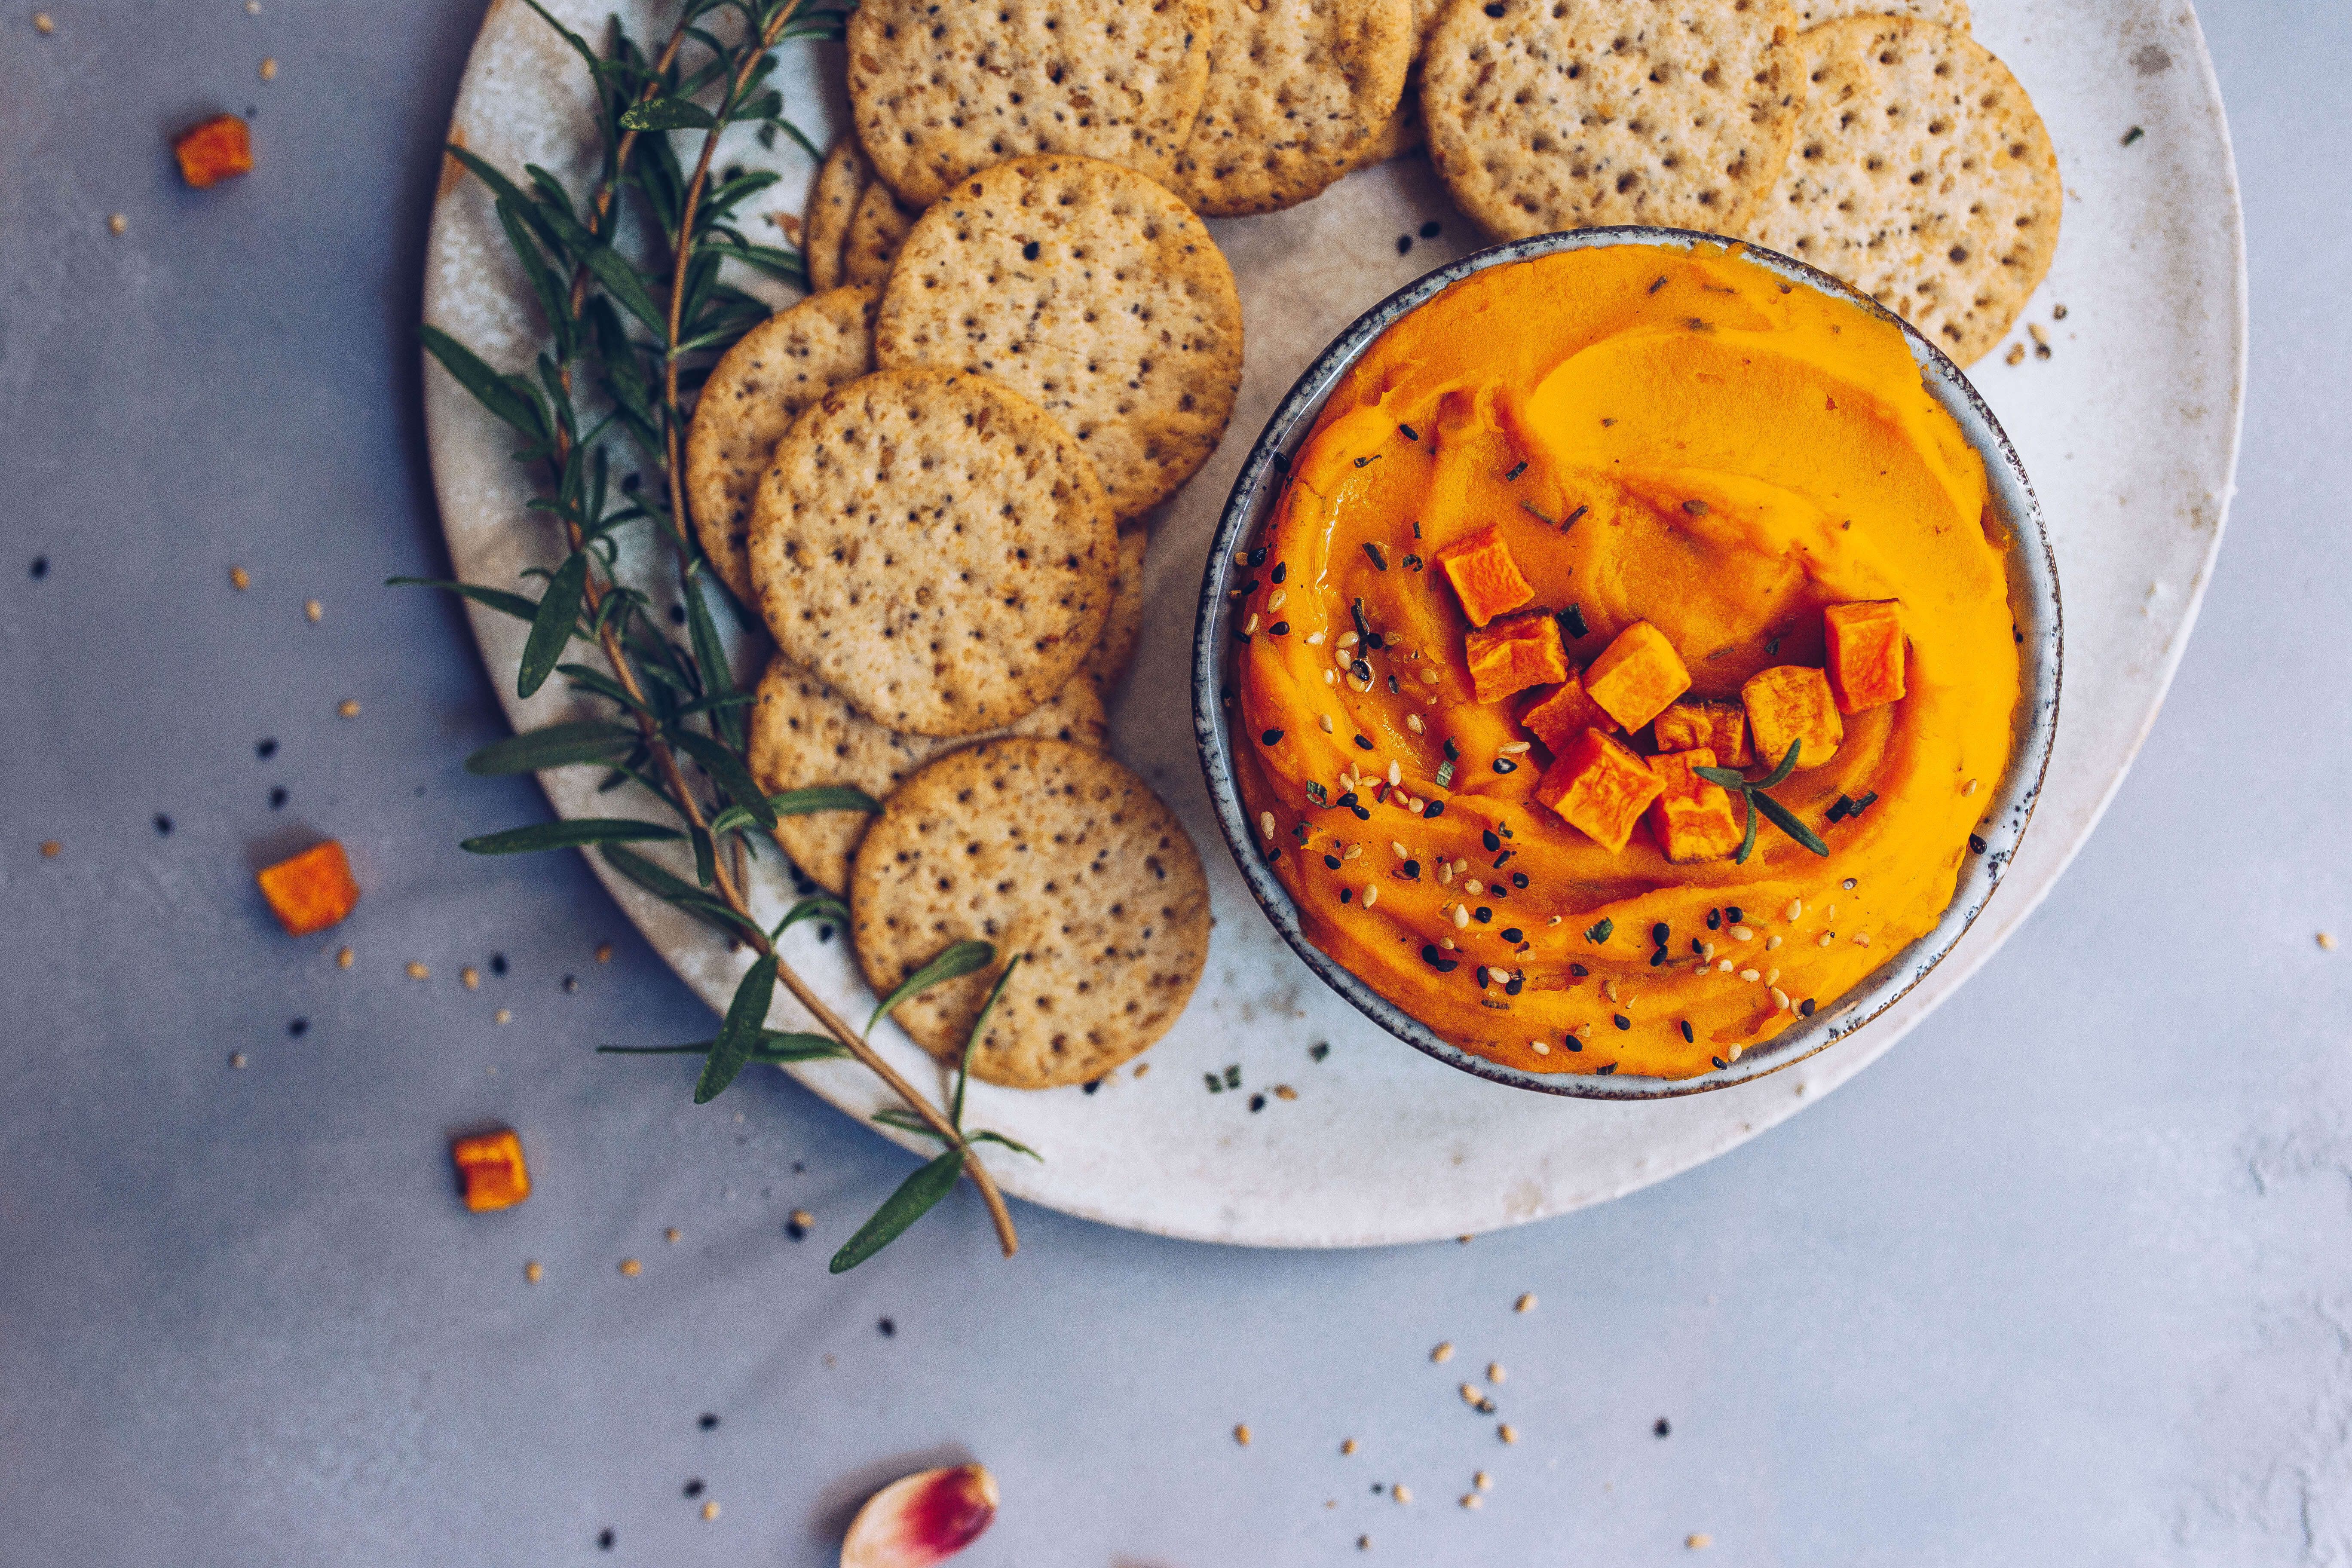 Roasted Garlic & Butternut Squash Dip (paleo, AIP-friendly) via Food by Mars